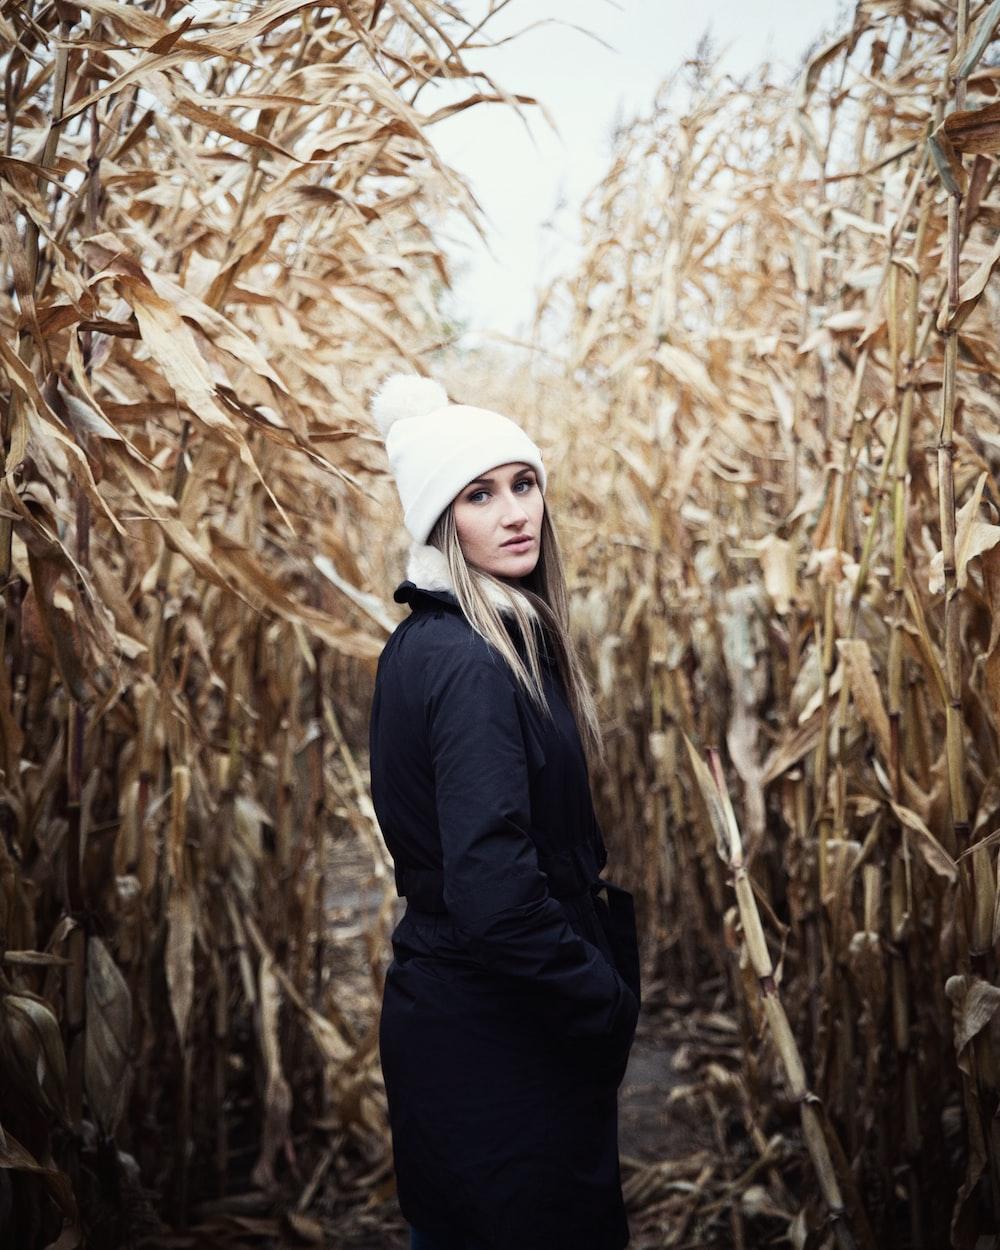 woman in black jacket at cornfield